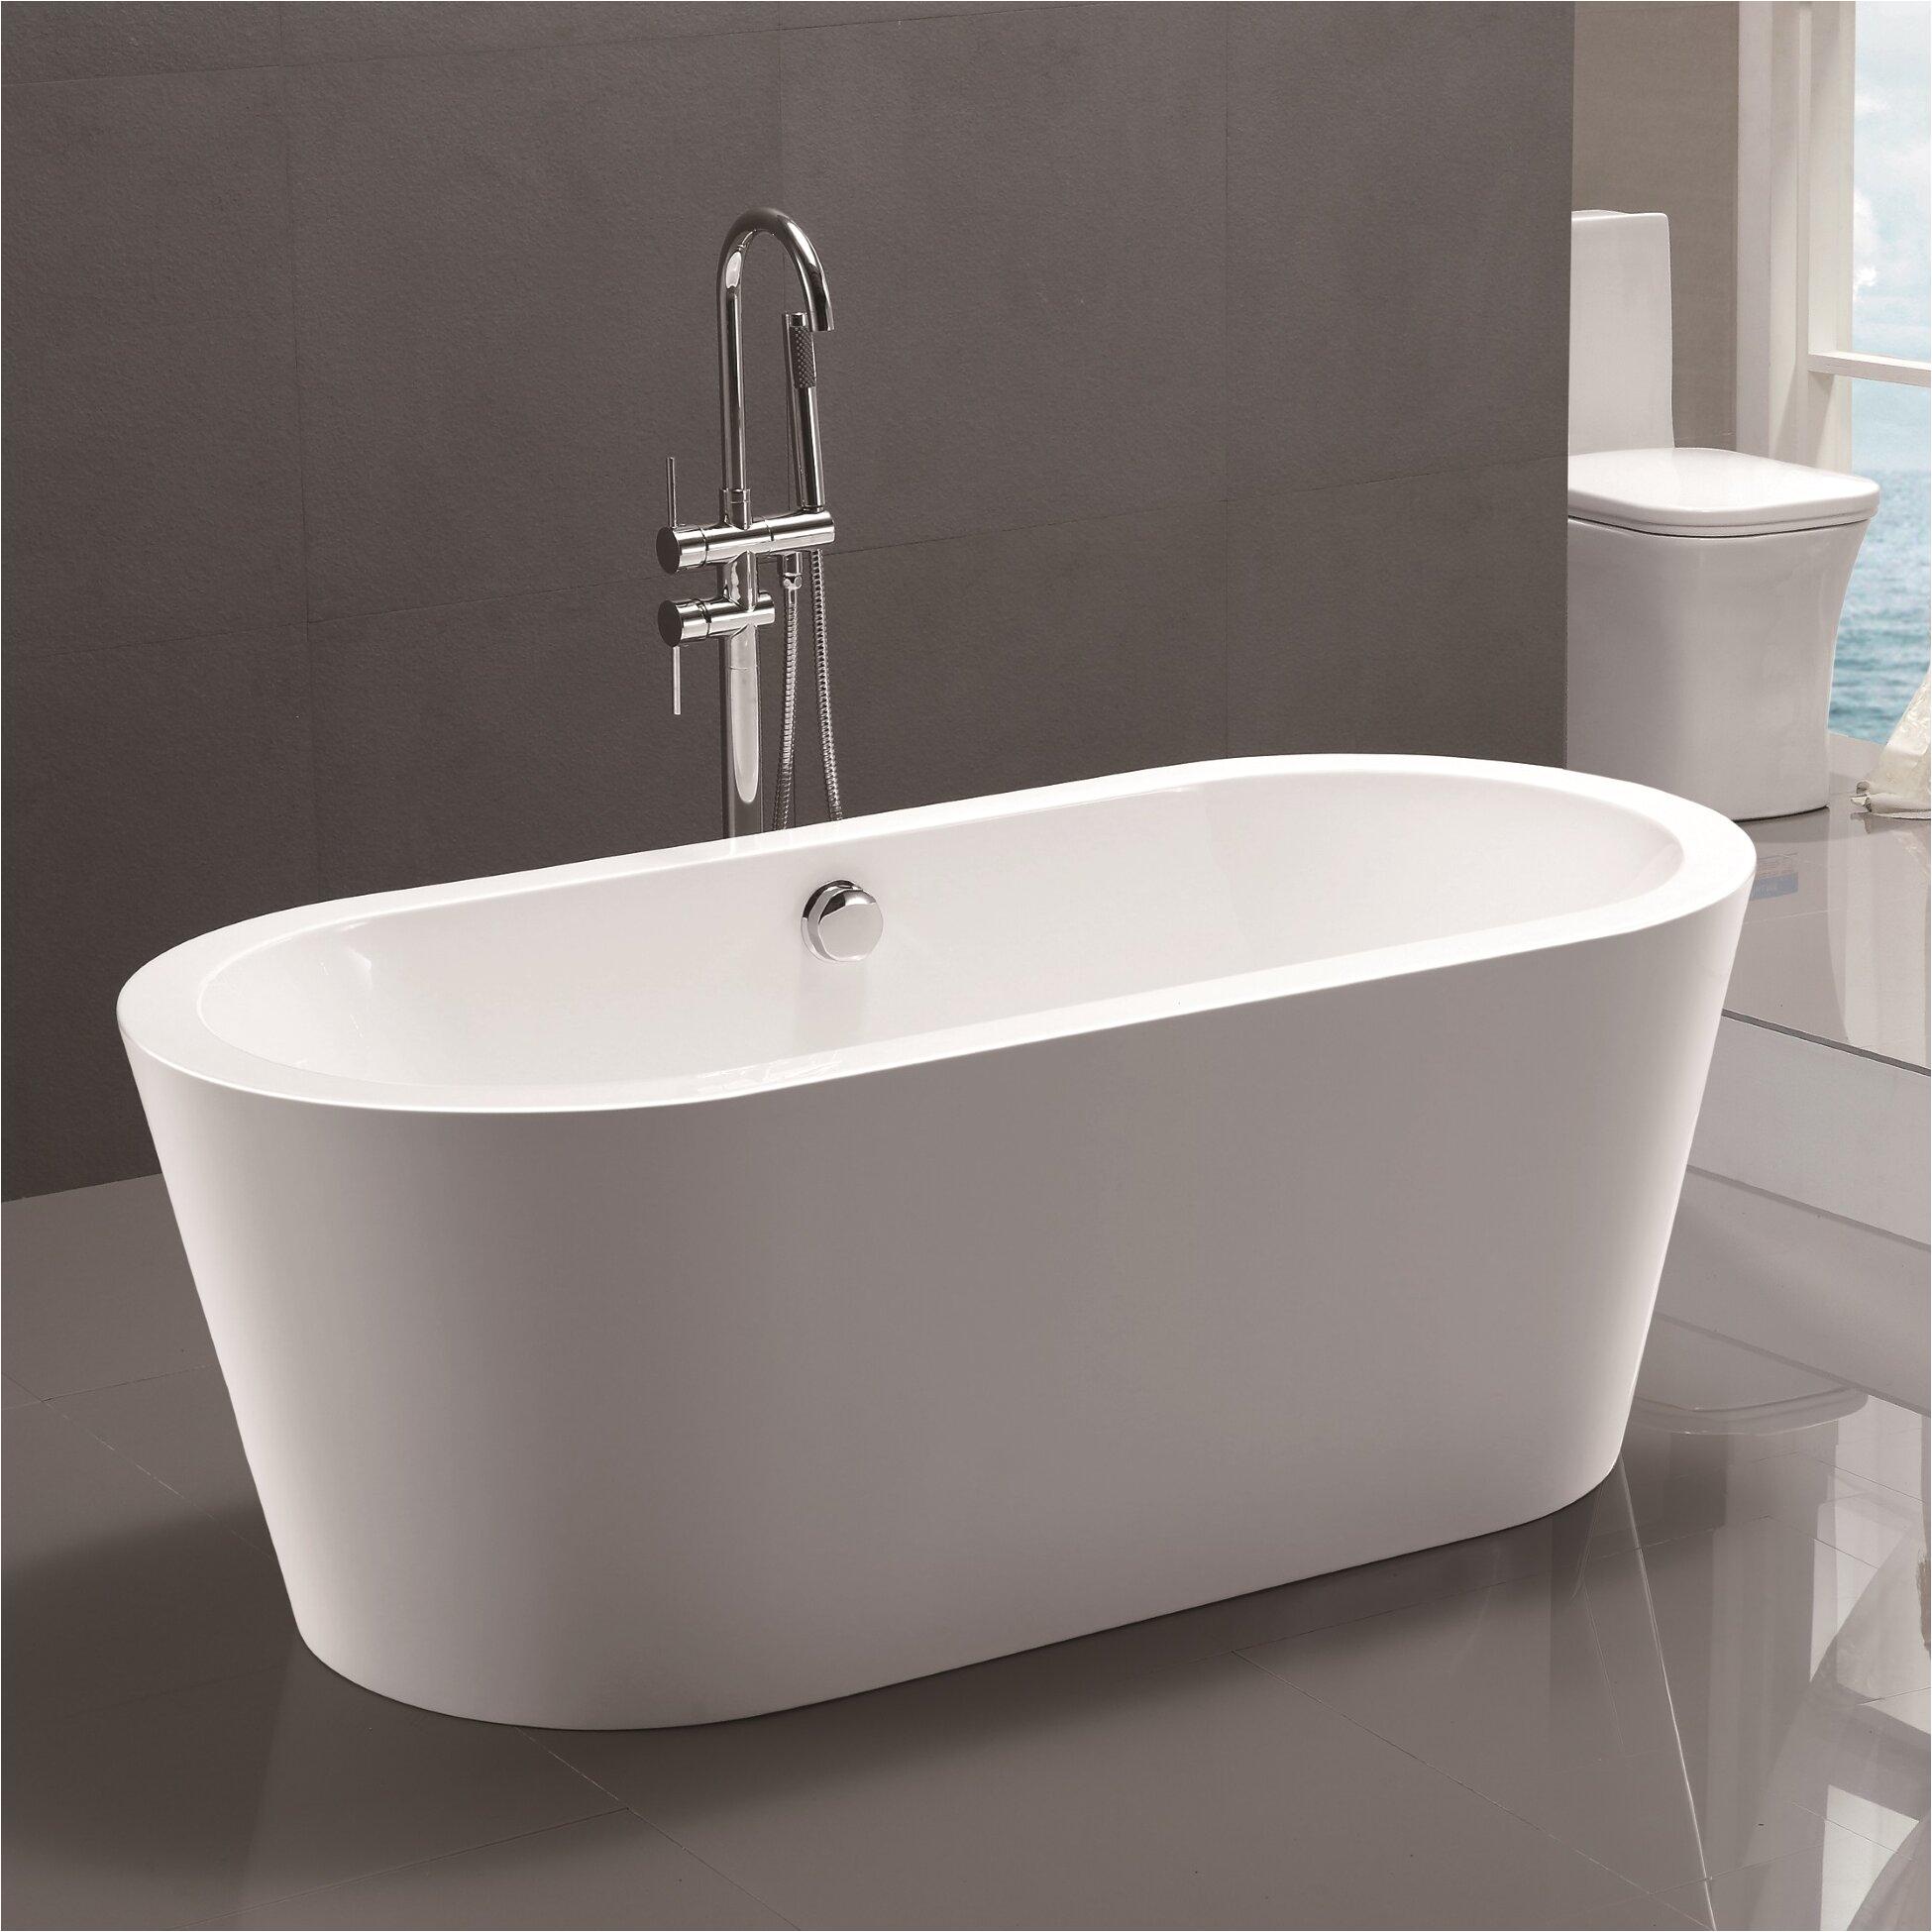 Vanity Art 59 x 24 Freestanding Soaking Bathtub VNAR1056